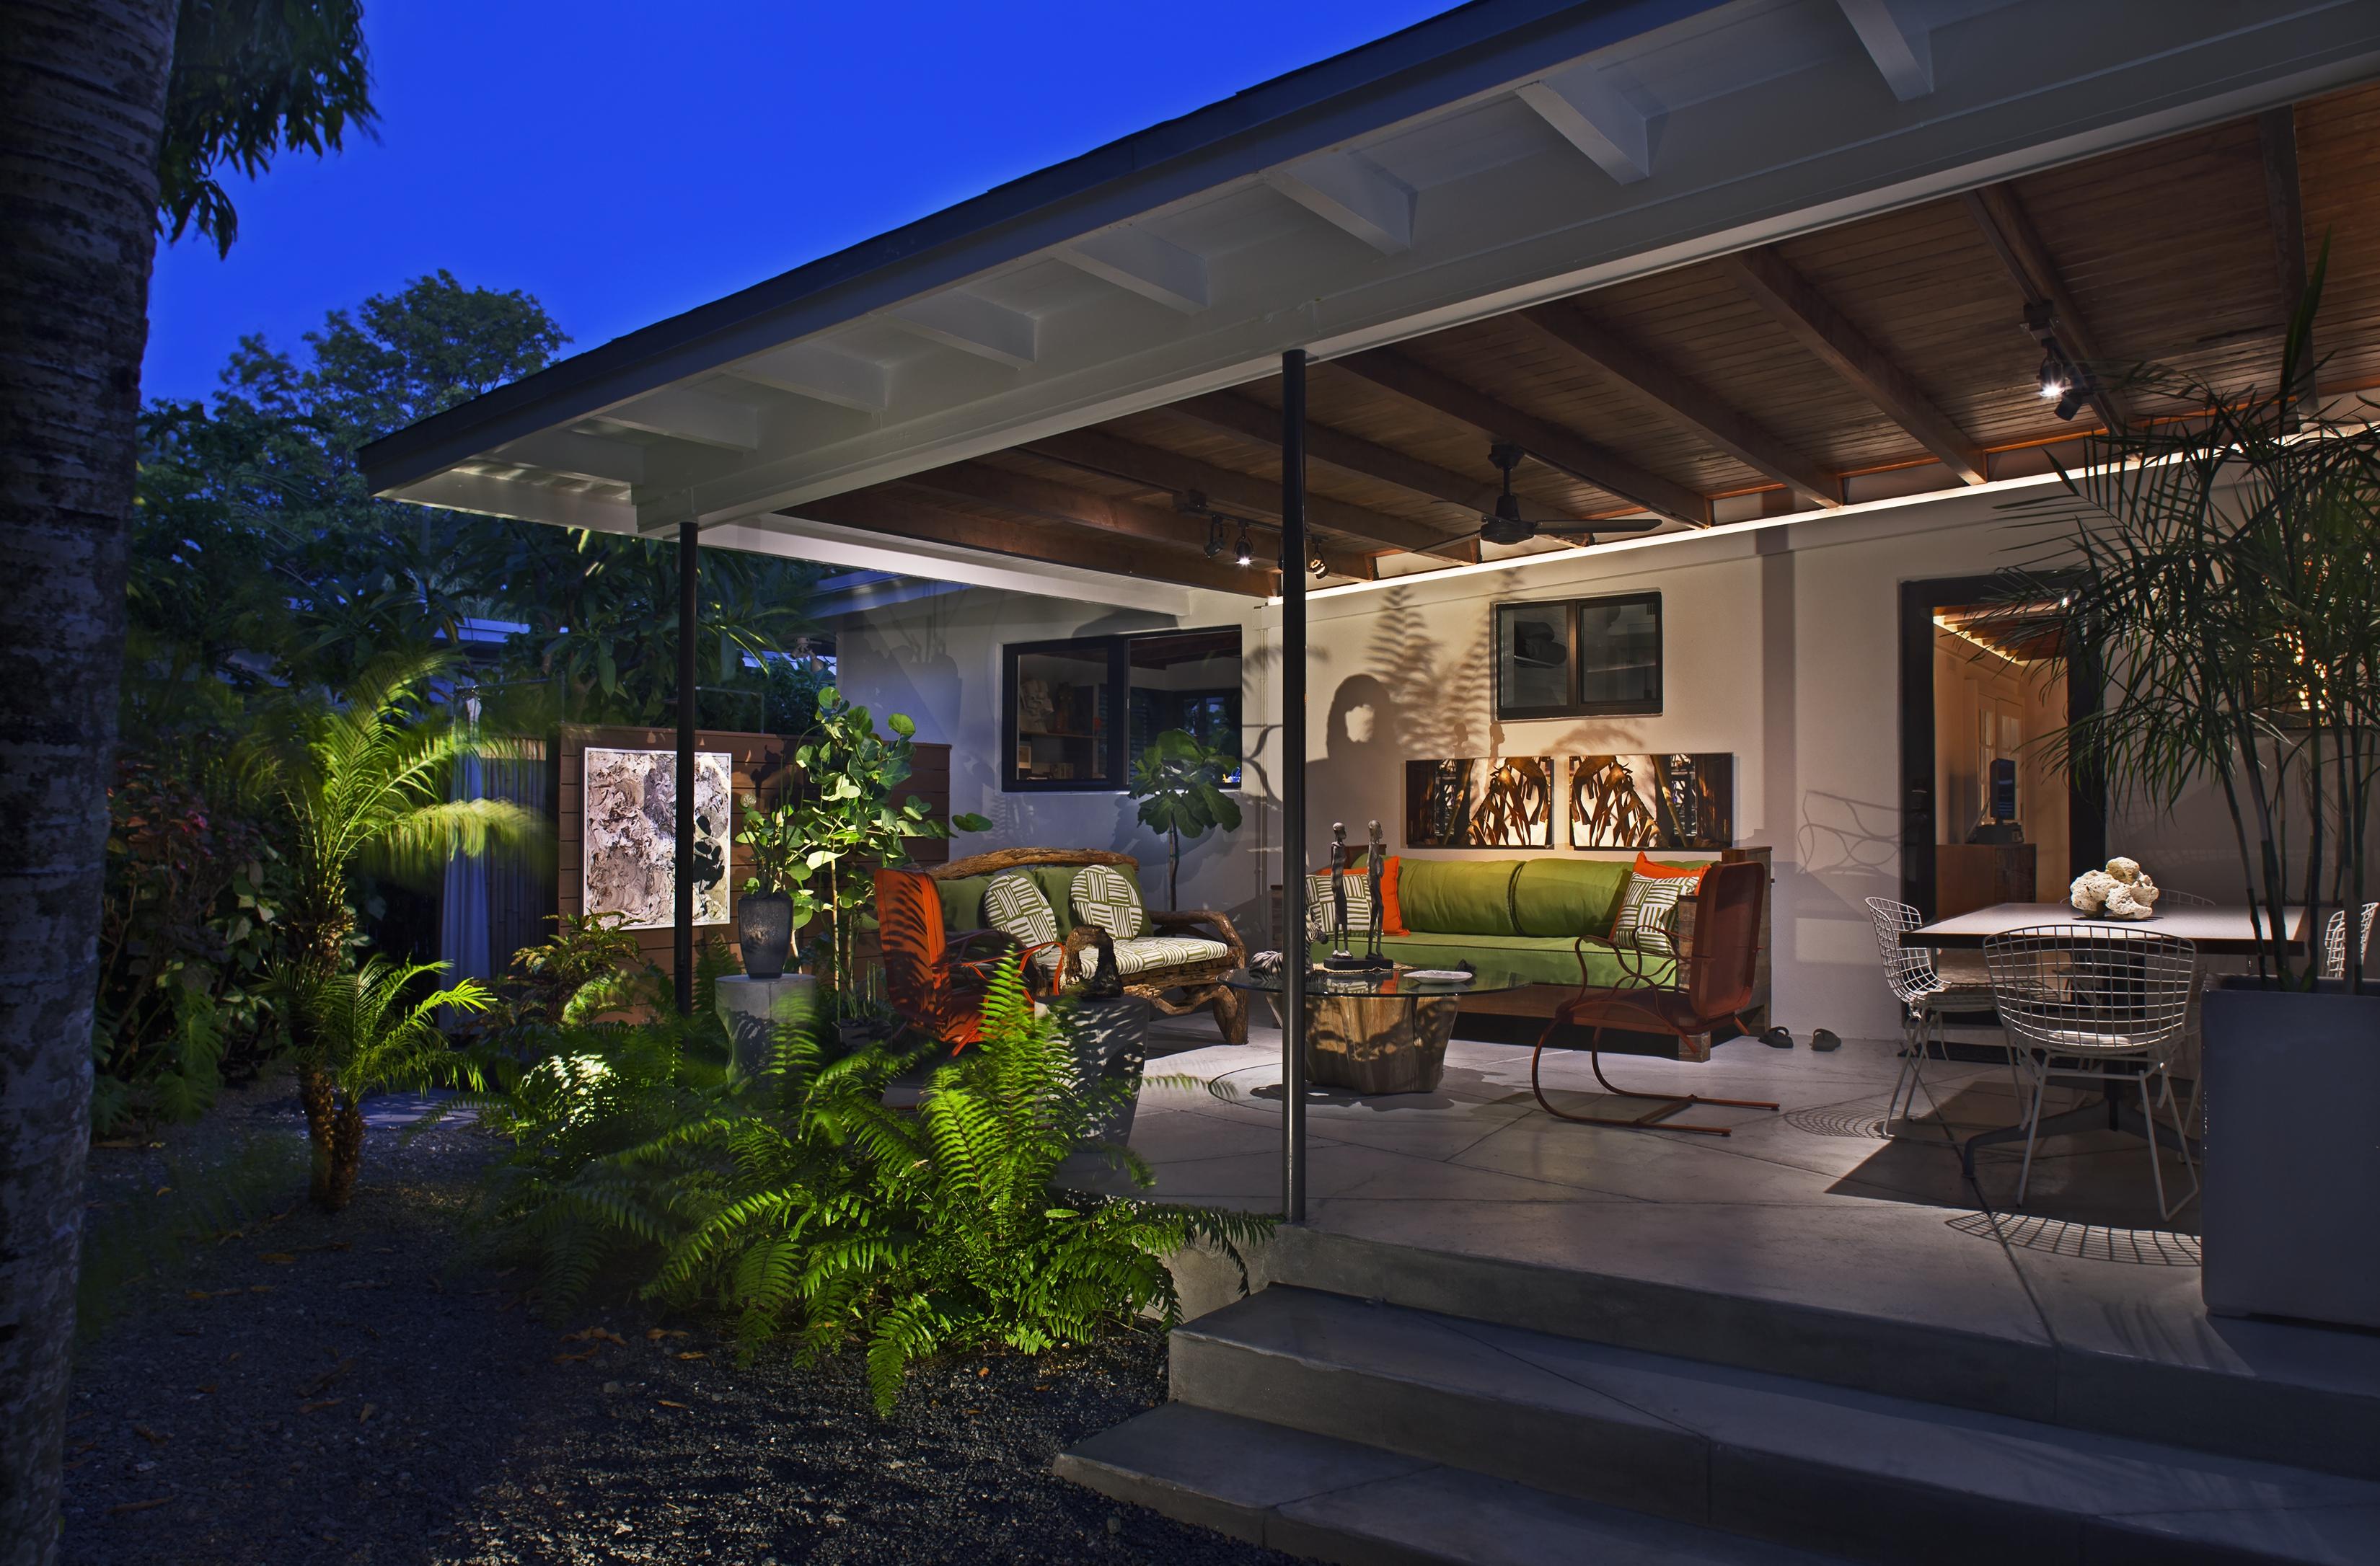 1517 Washington St Key West, Backyard at Night